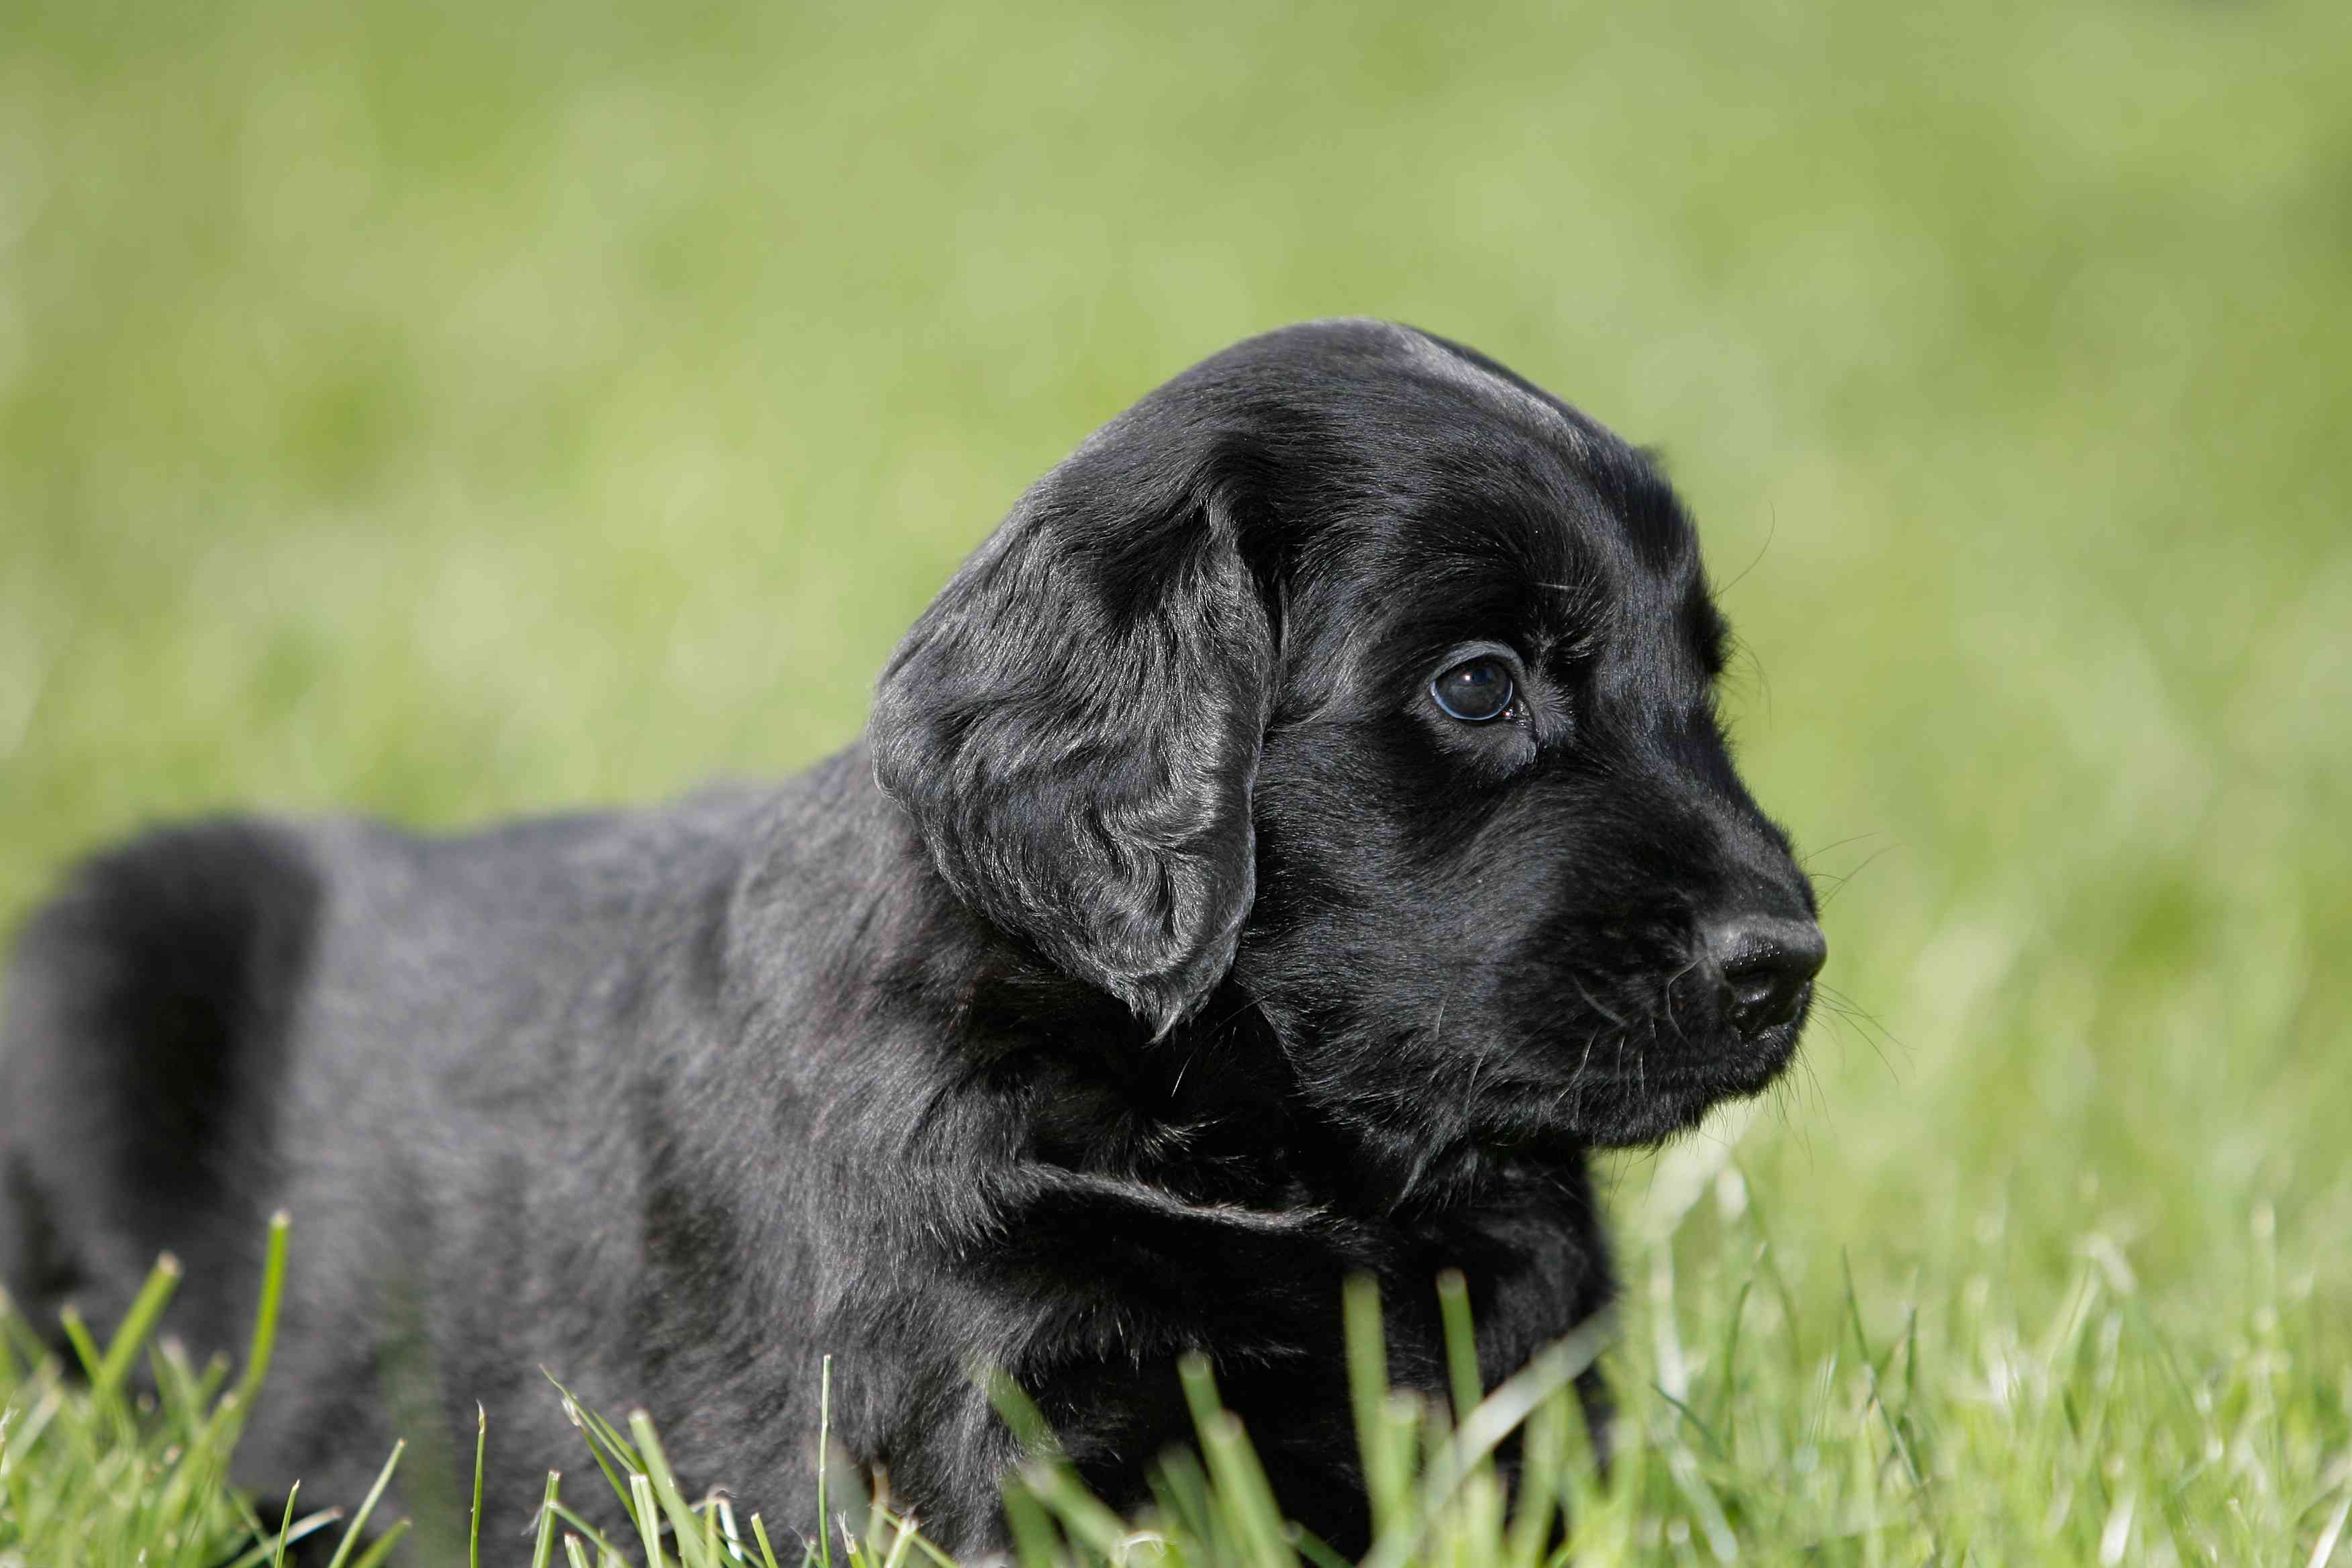 Black Flat-Coated Retriever puppy in grass.